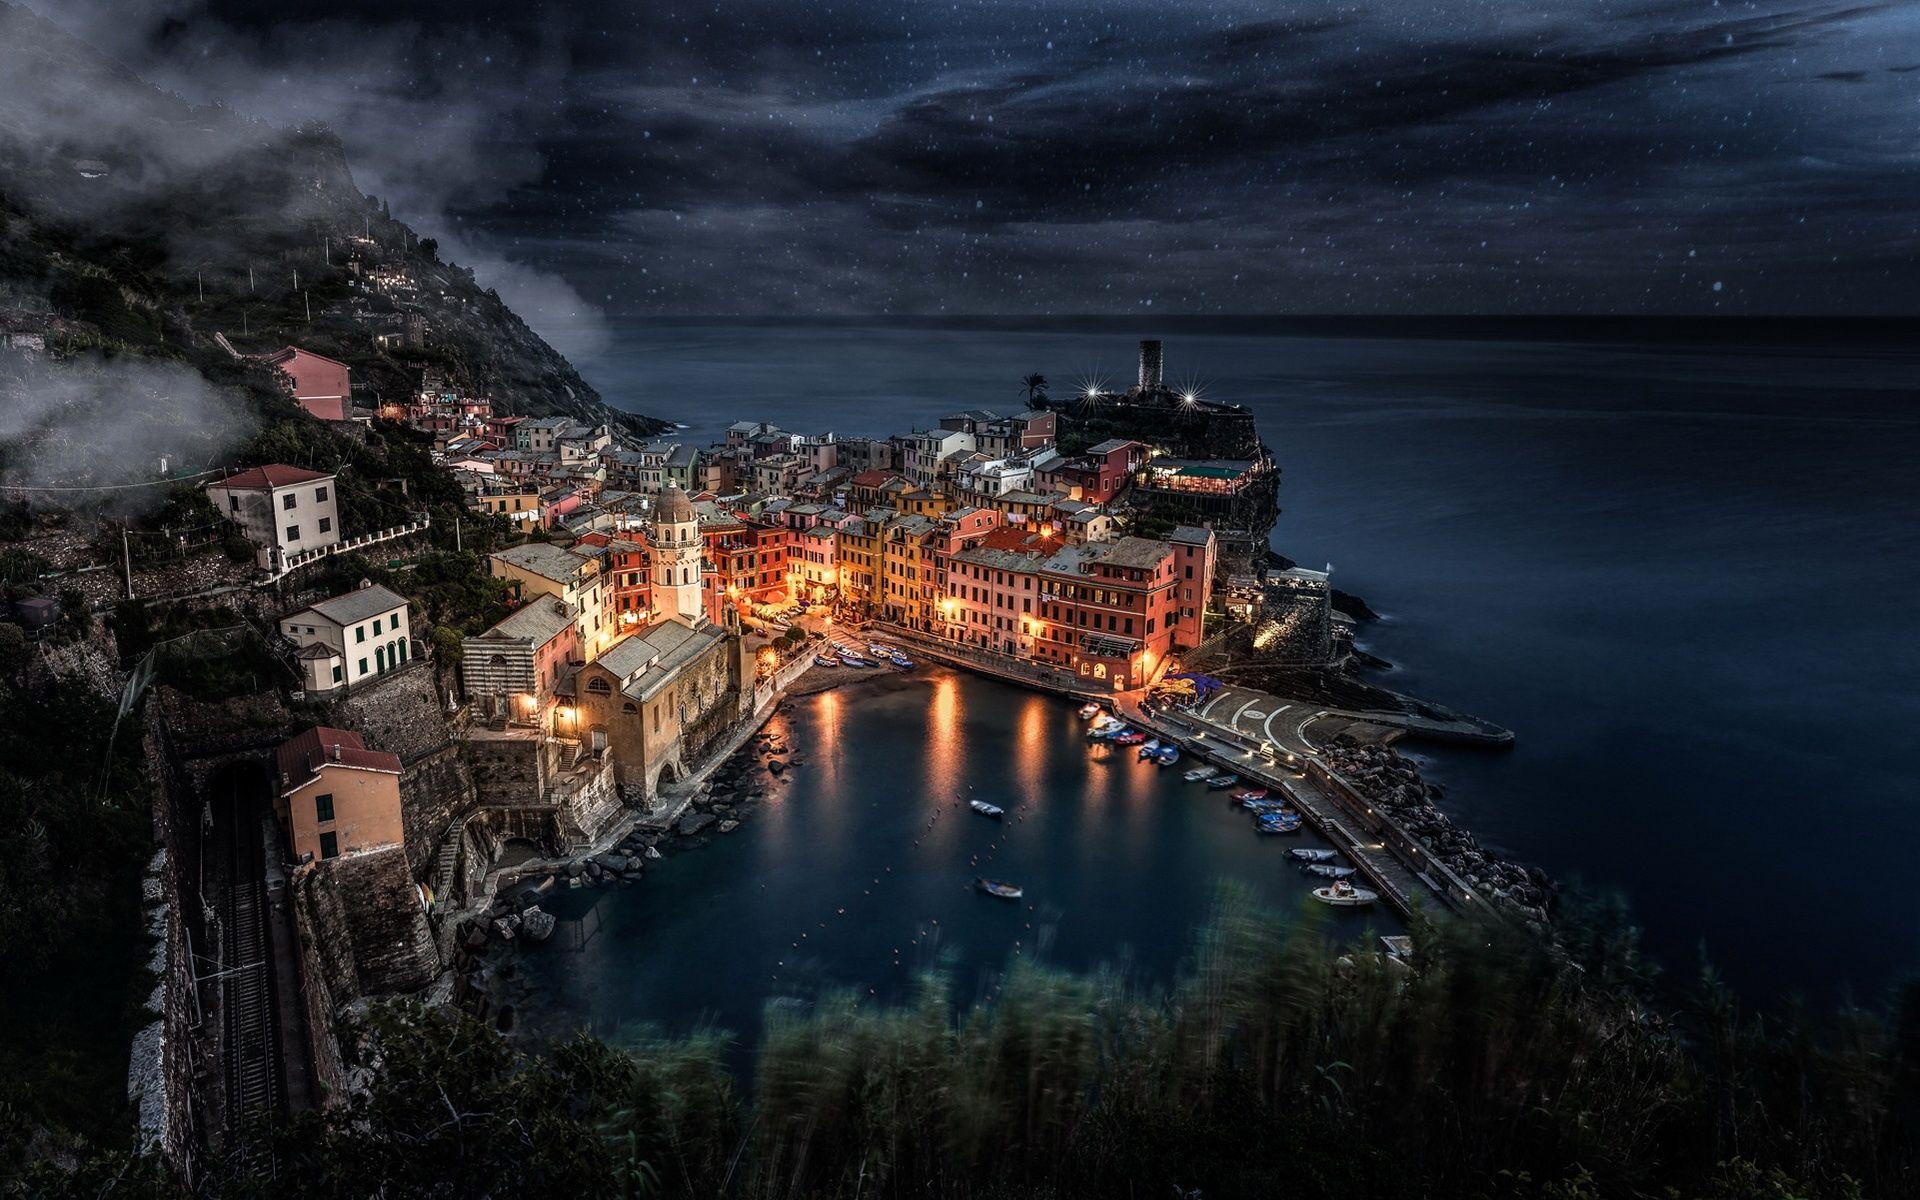 Home - Wallpapers / Photographs - Locality - Liguria, Manarola (Italy)